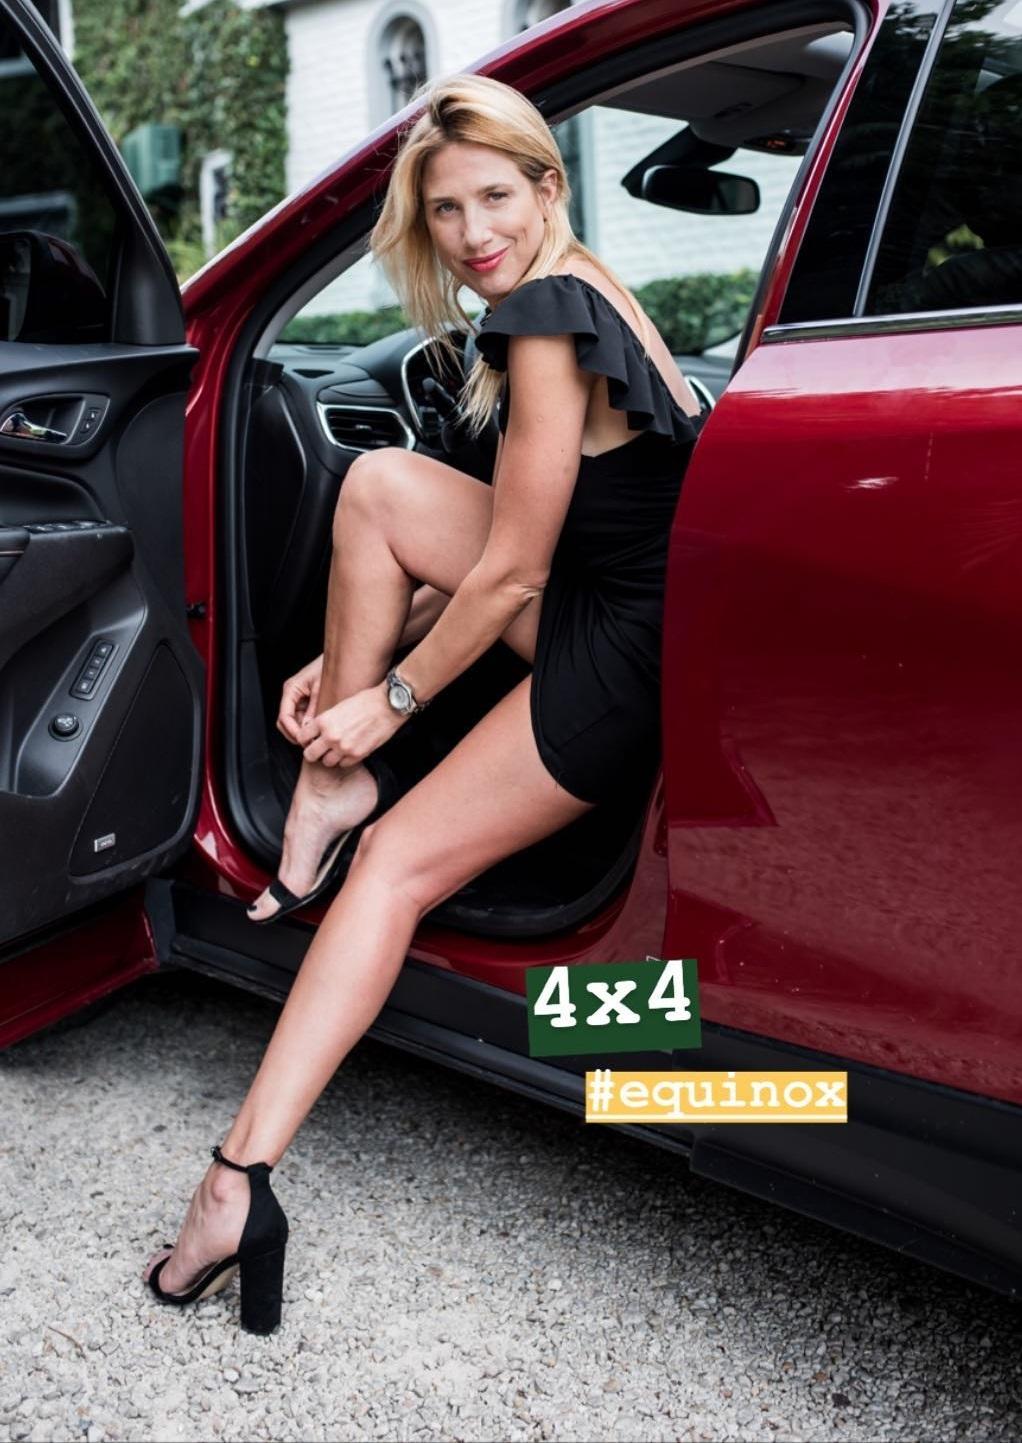 Alina-Moine-Feet-4522972.jpg